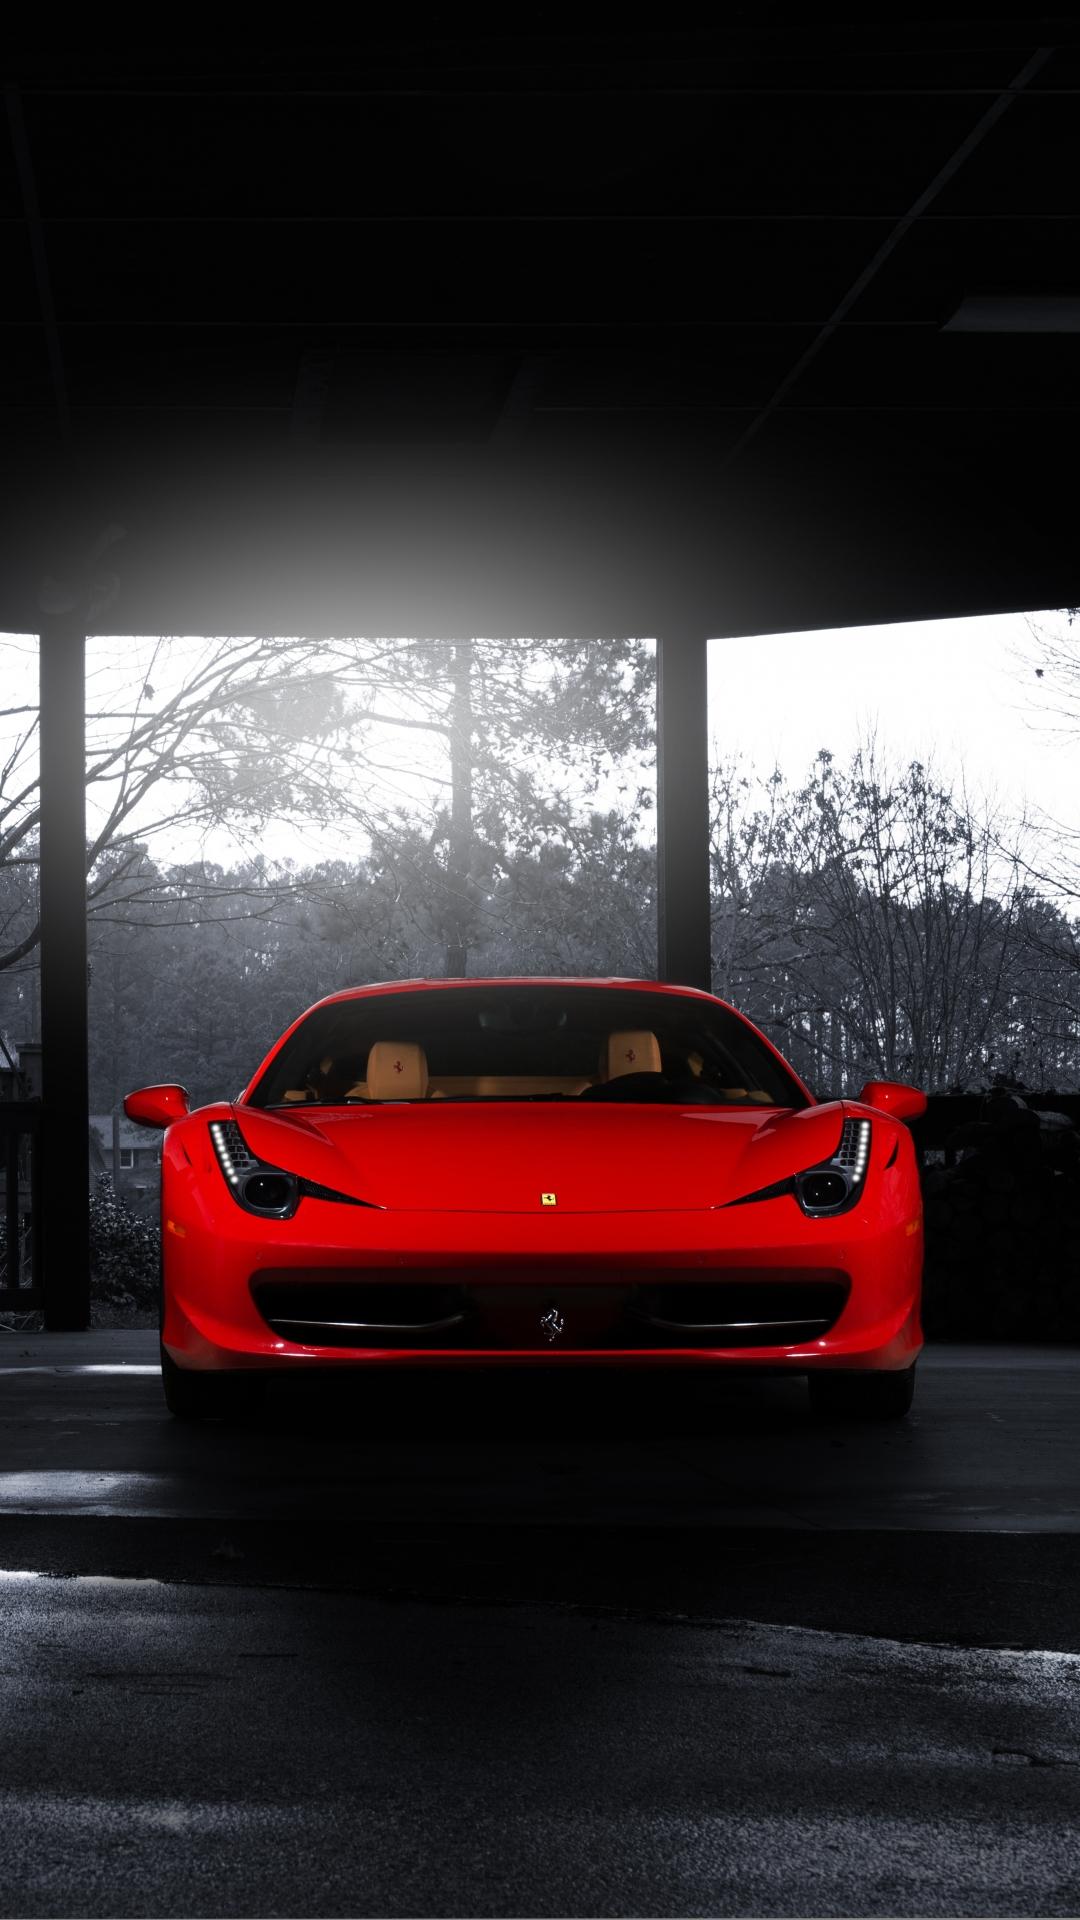 Racing Car Hd Wallpaper Free Download Ferrari Iphone Wallpapers Pixelstalk Net